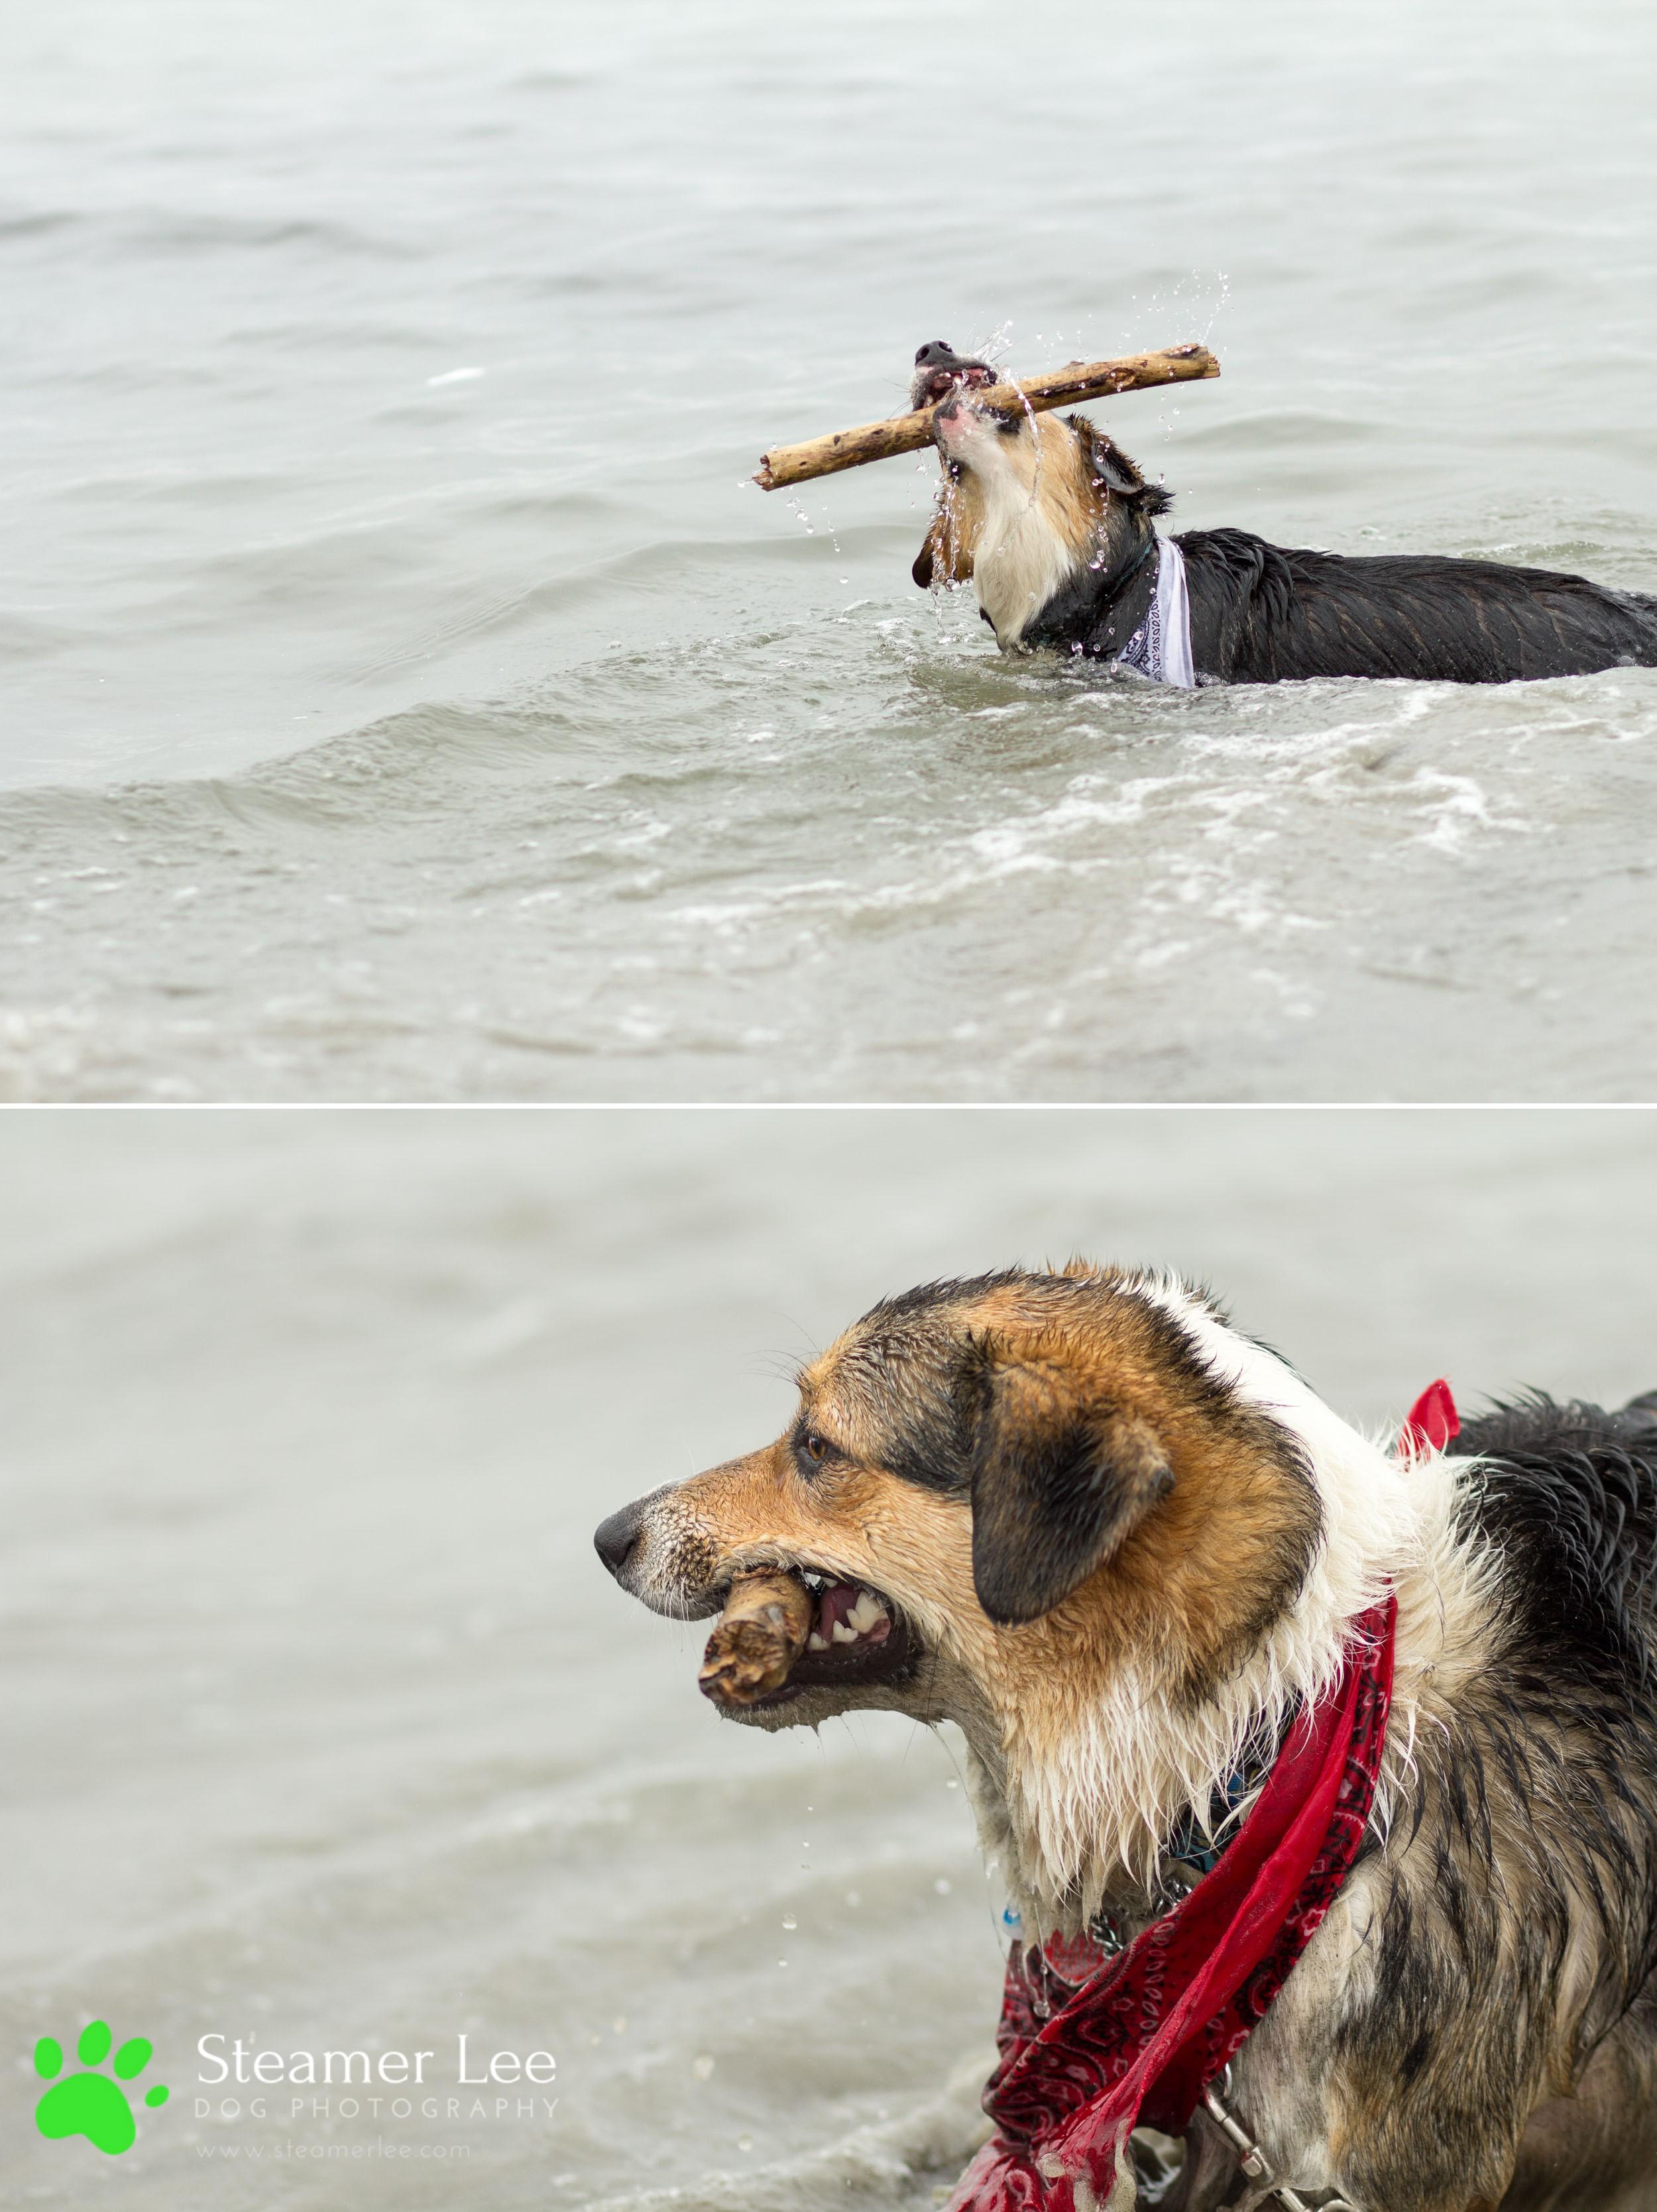 Steamer Lee Dog Photography - July 2017 So Cal Corgi Beach Day - Vol.2 - 11.jpg